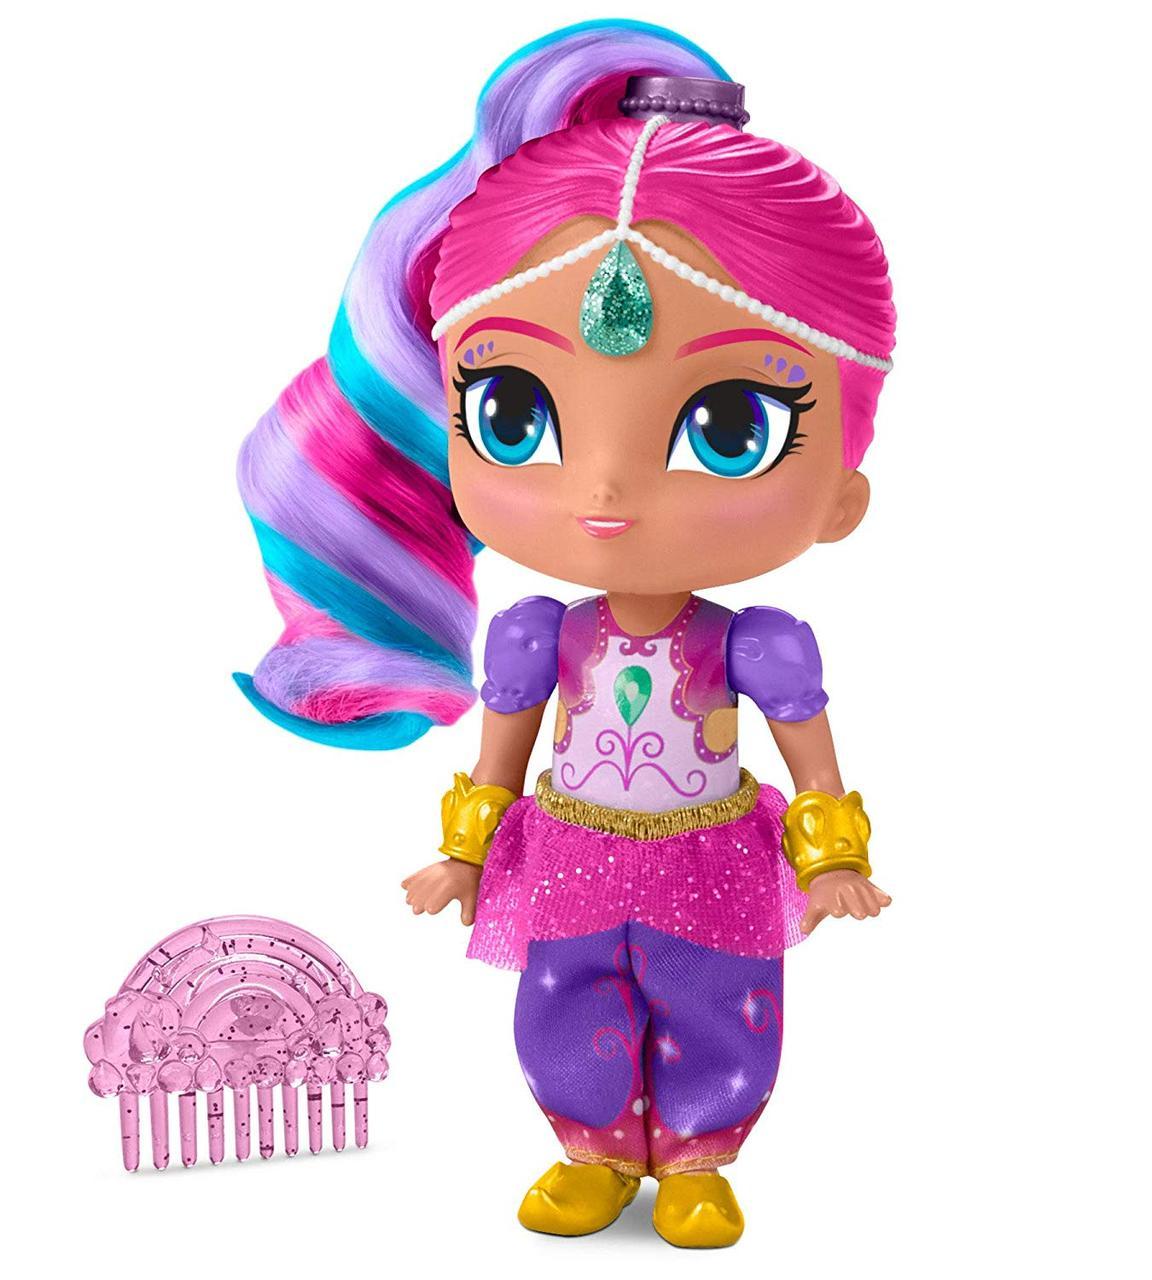 Кукла Fisher-Price Шиммер и Шайн кукла Шиммер радужная FNH25 Shimmer Shine